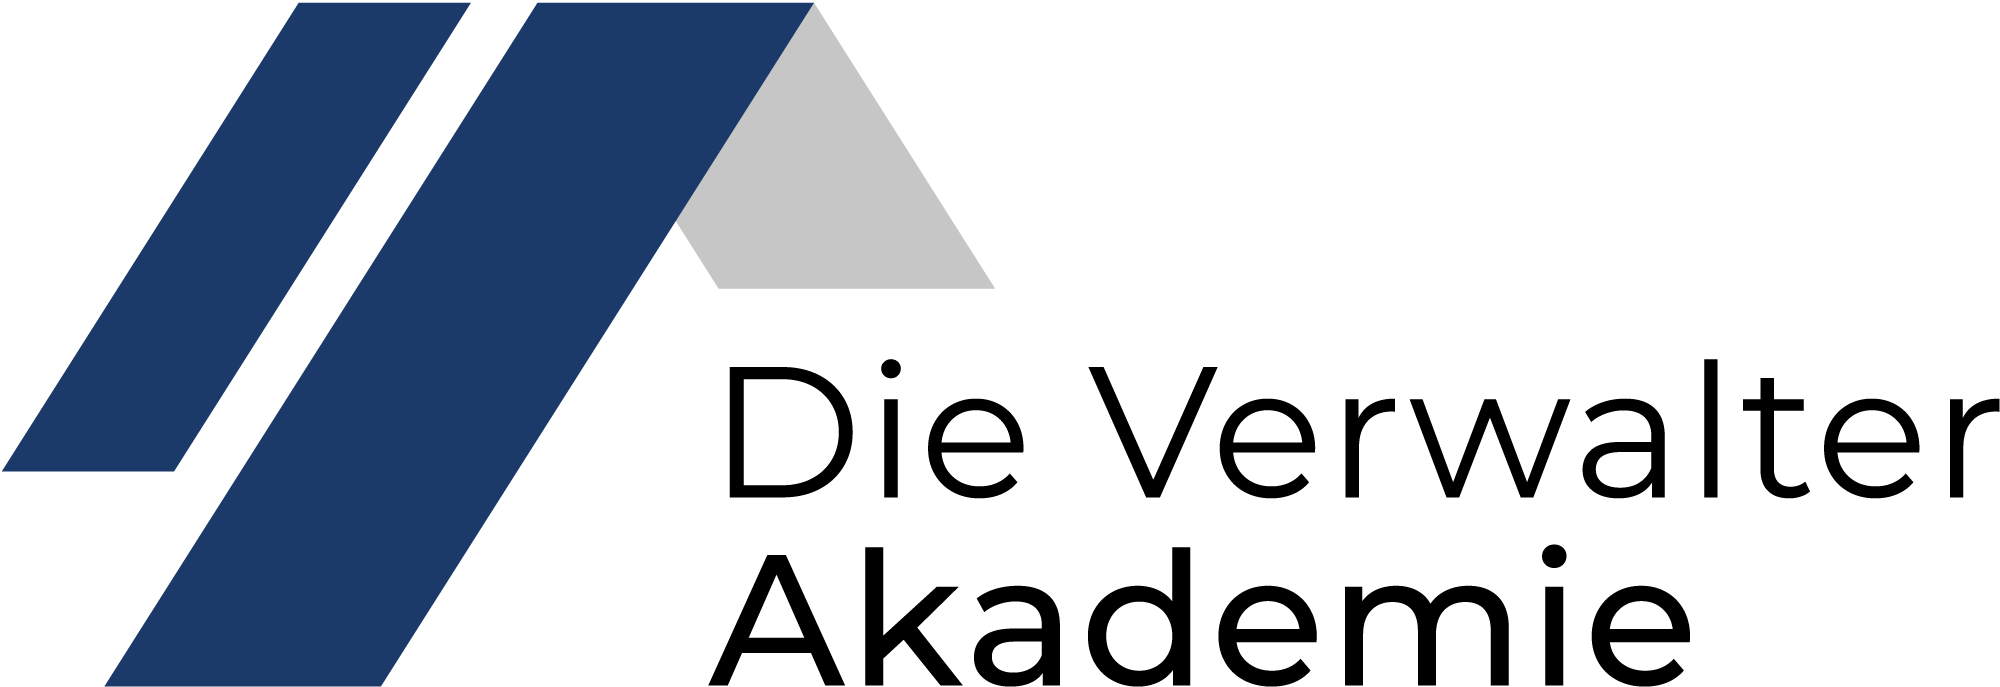 LogoFarbe_VerwalterAkademie.png